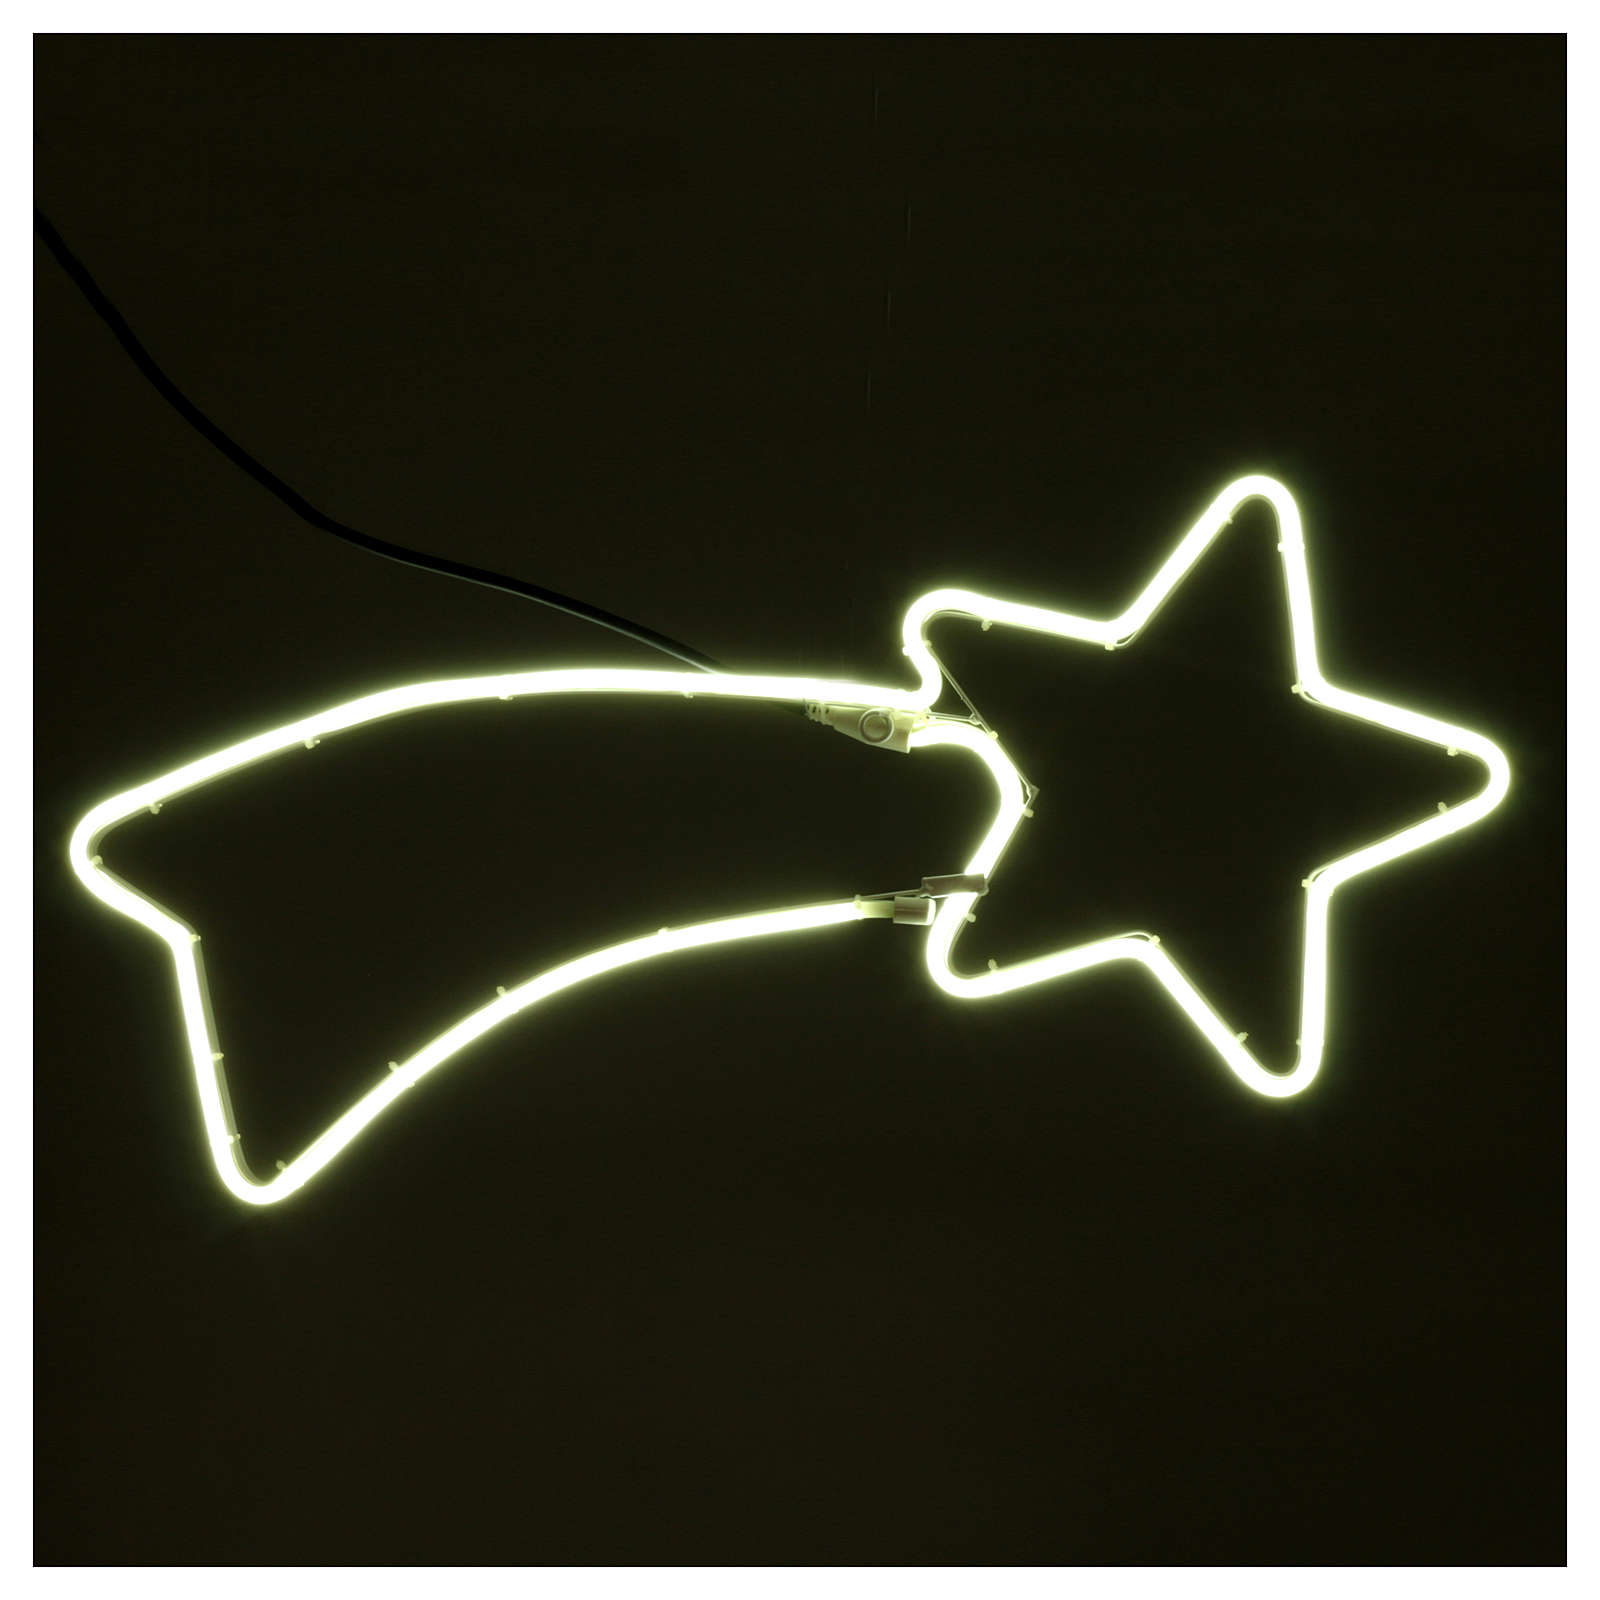 Comet star 240 leds ice white neon tube 3